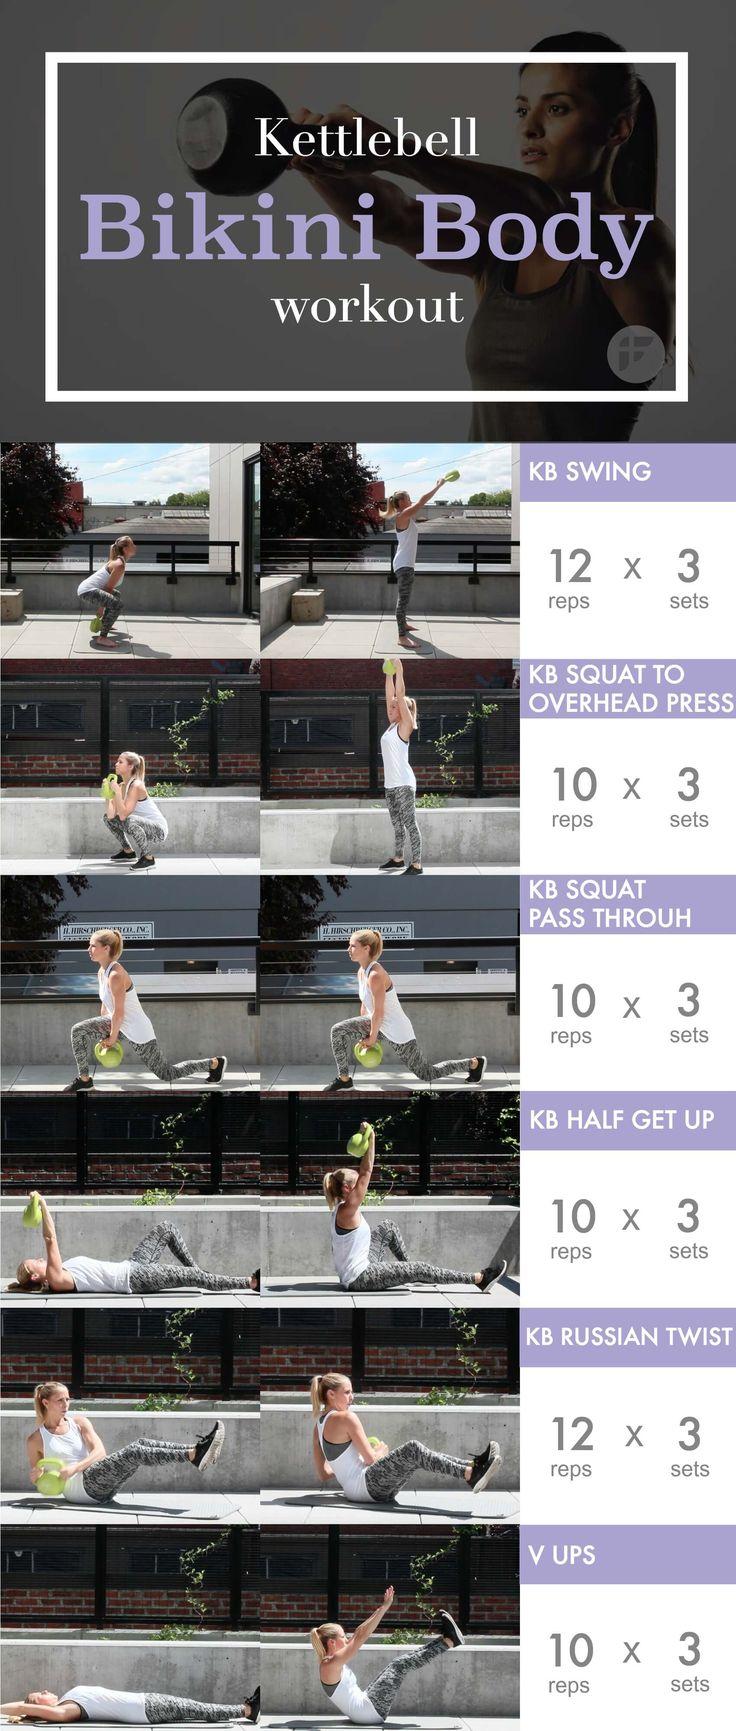 20-Minute Kettlebell Bikini Body Workout